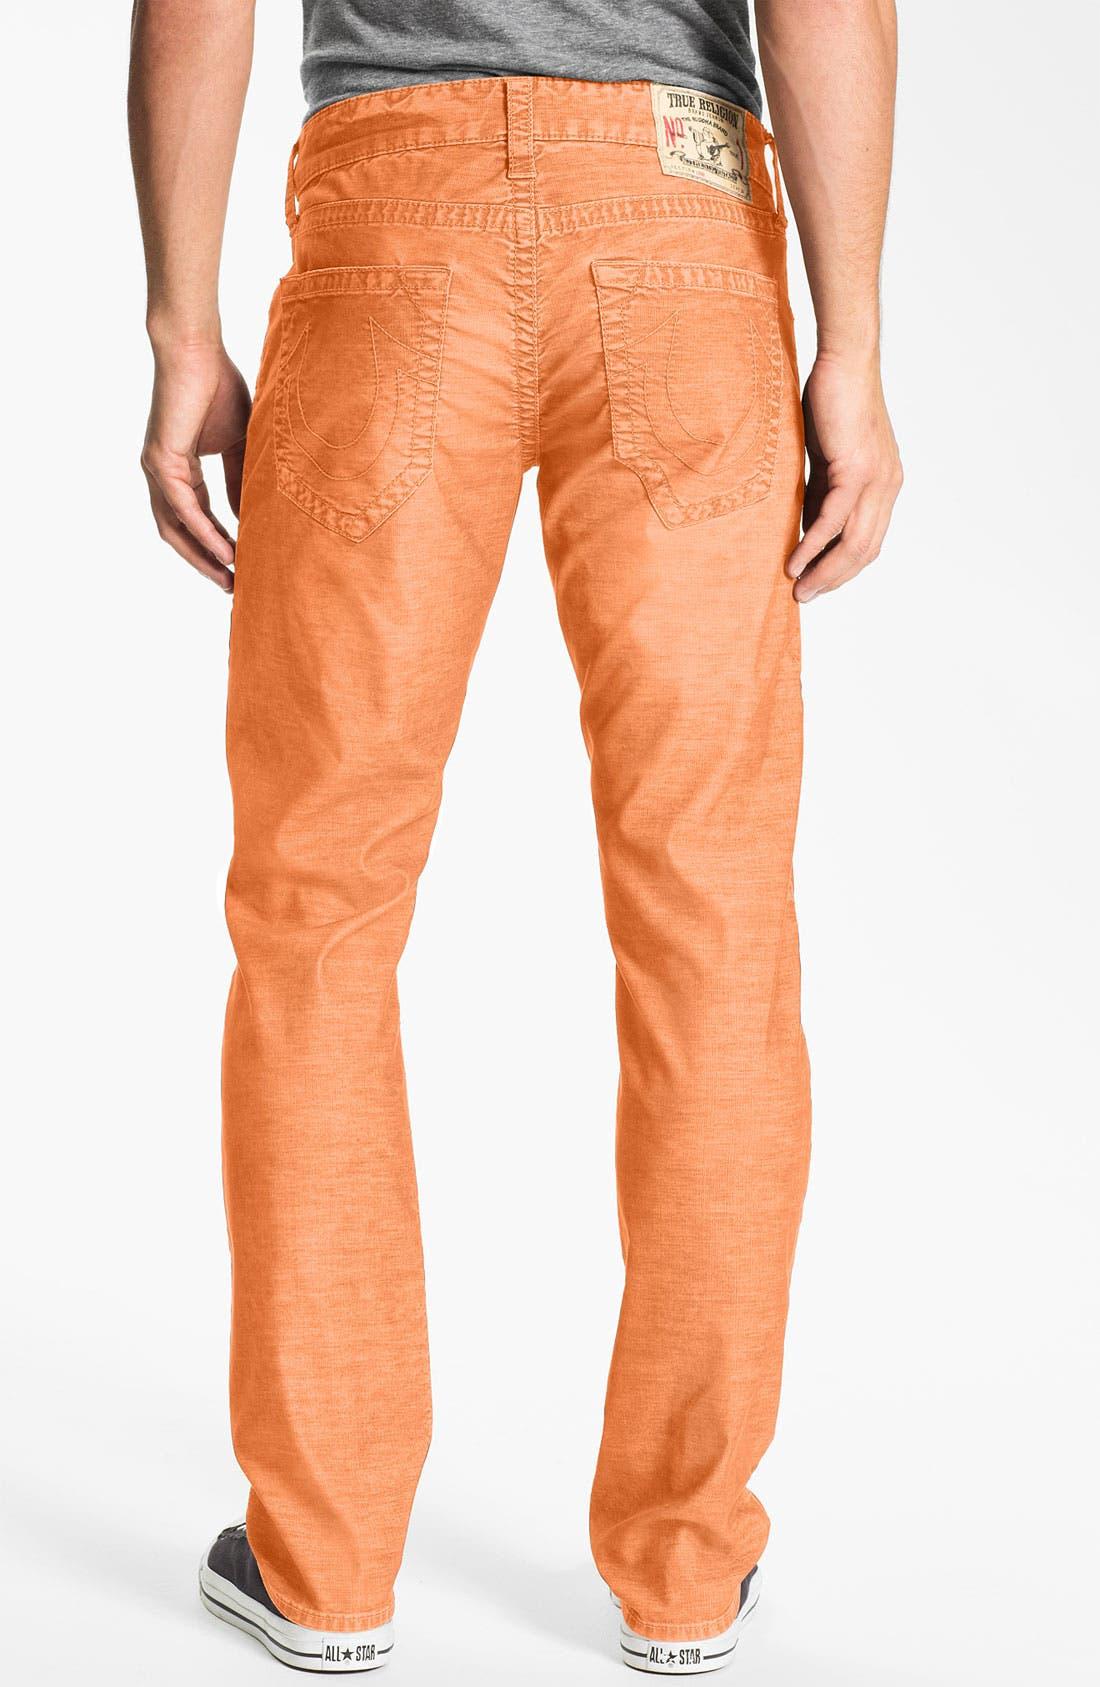 Alternate Image 1 Selected - True Religion Brand Jeans 'Geno' Slim Corduroy Pants (Online Only)